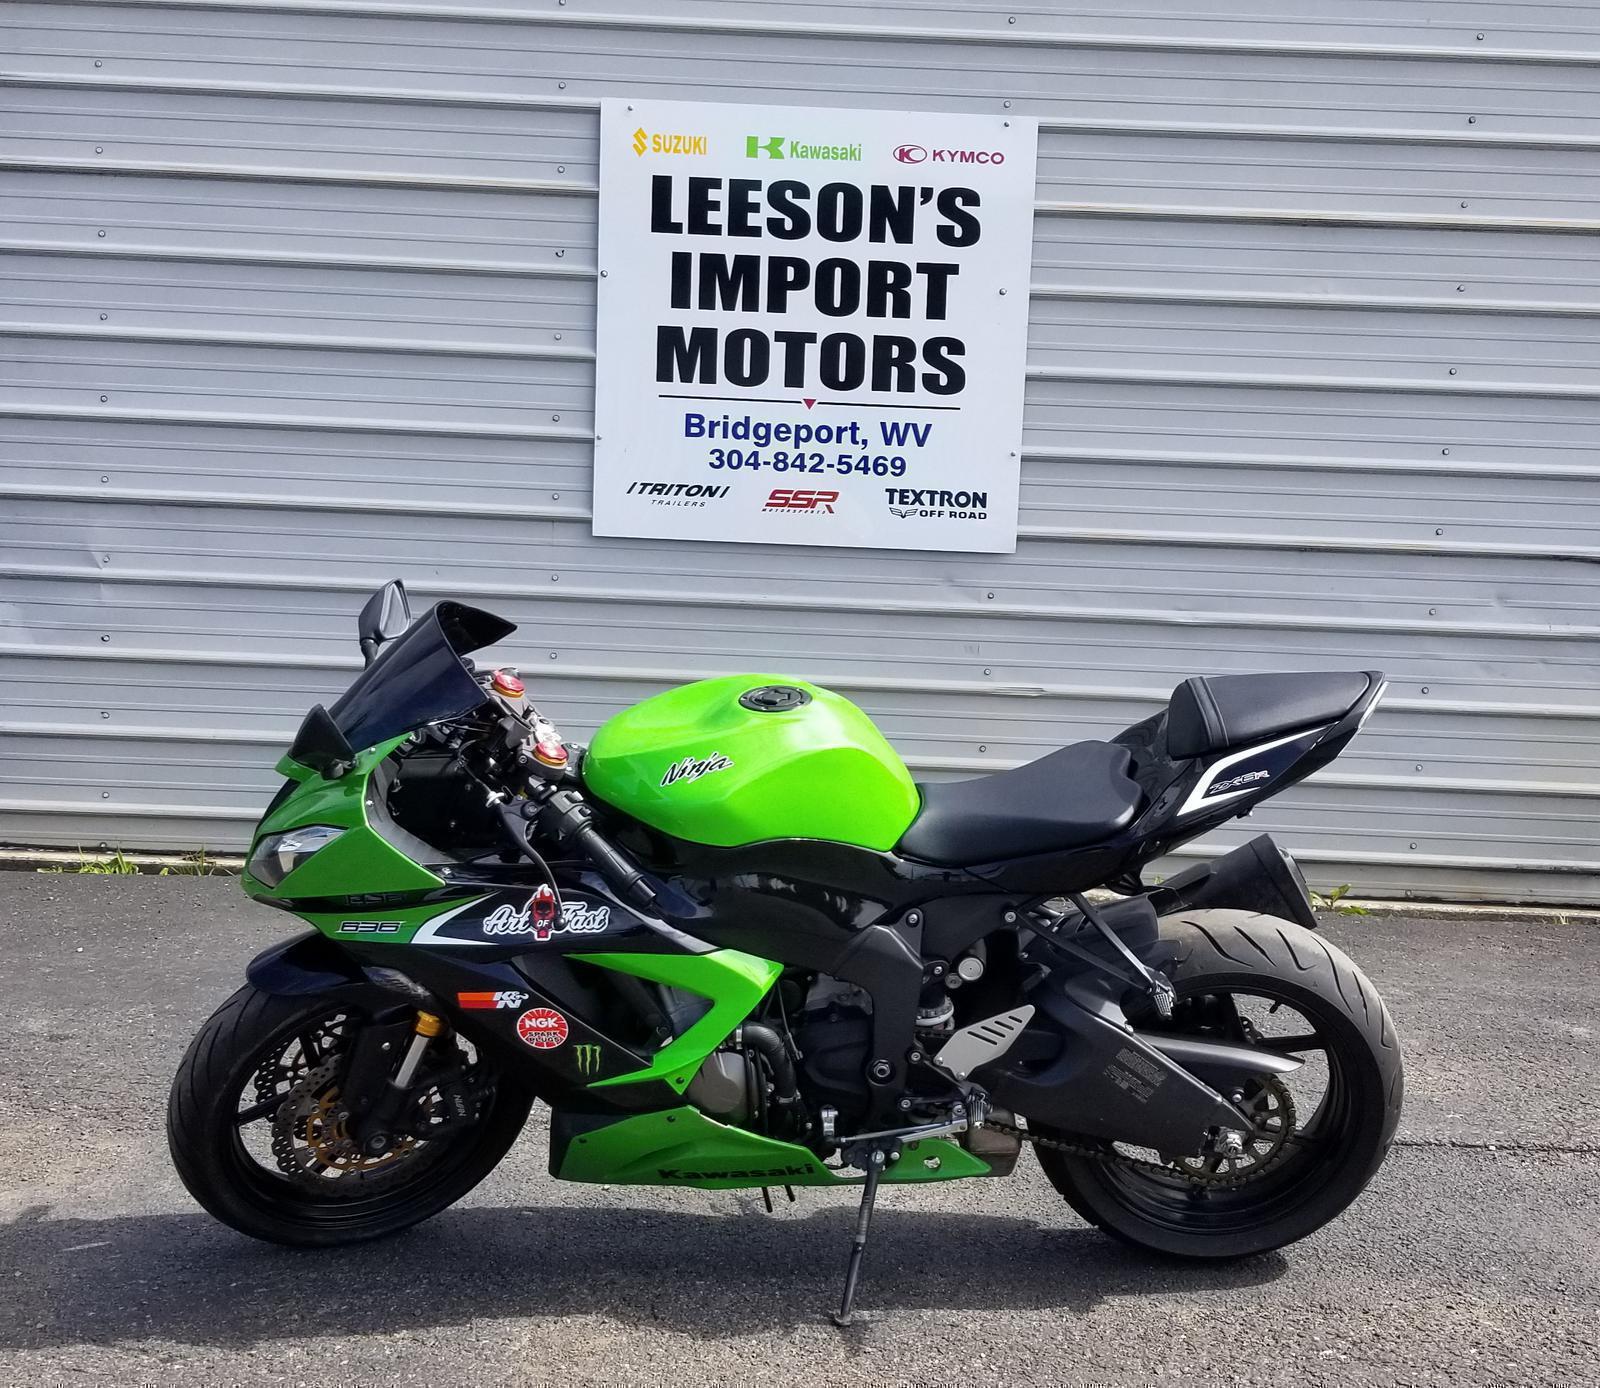 2013 Kawasaki Ninja® ZX™-6R for sale in Bridgeport, WV